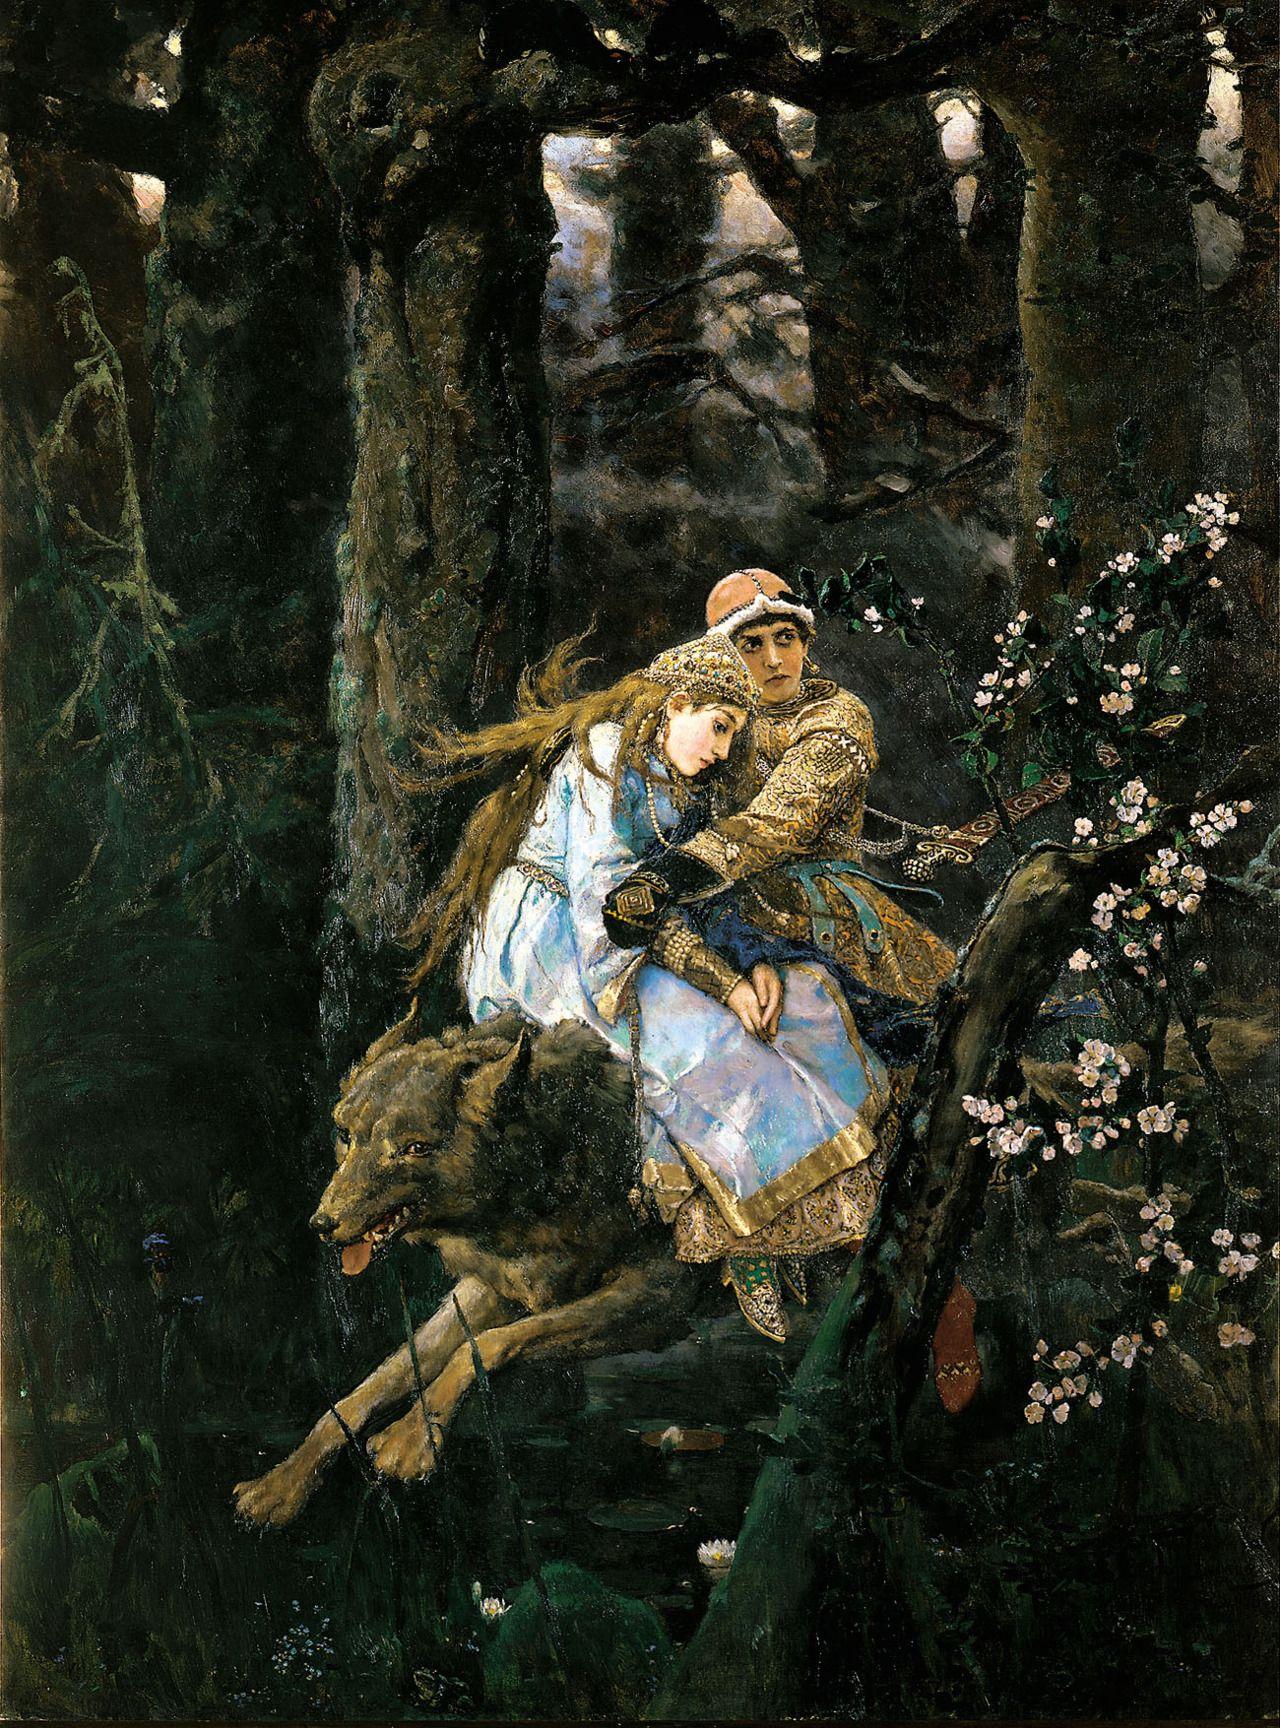 Ivan Tsarevich riding the Gray Wolf (Иван-царевич на Сером Волке) byViktorMikhaylovichVasnetsov, 1889.